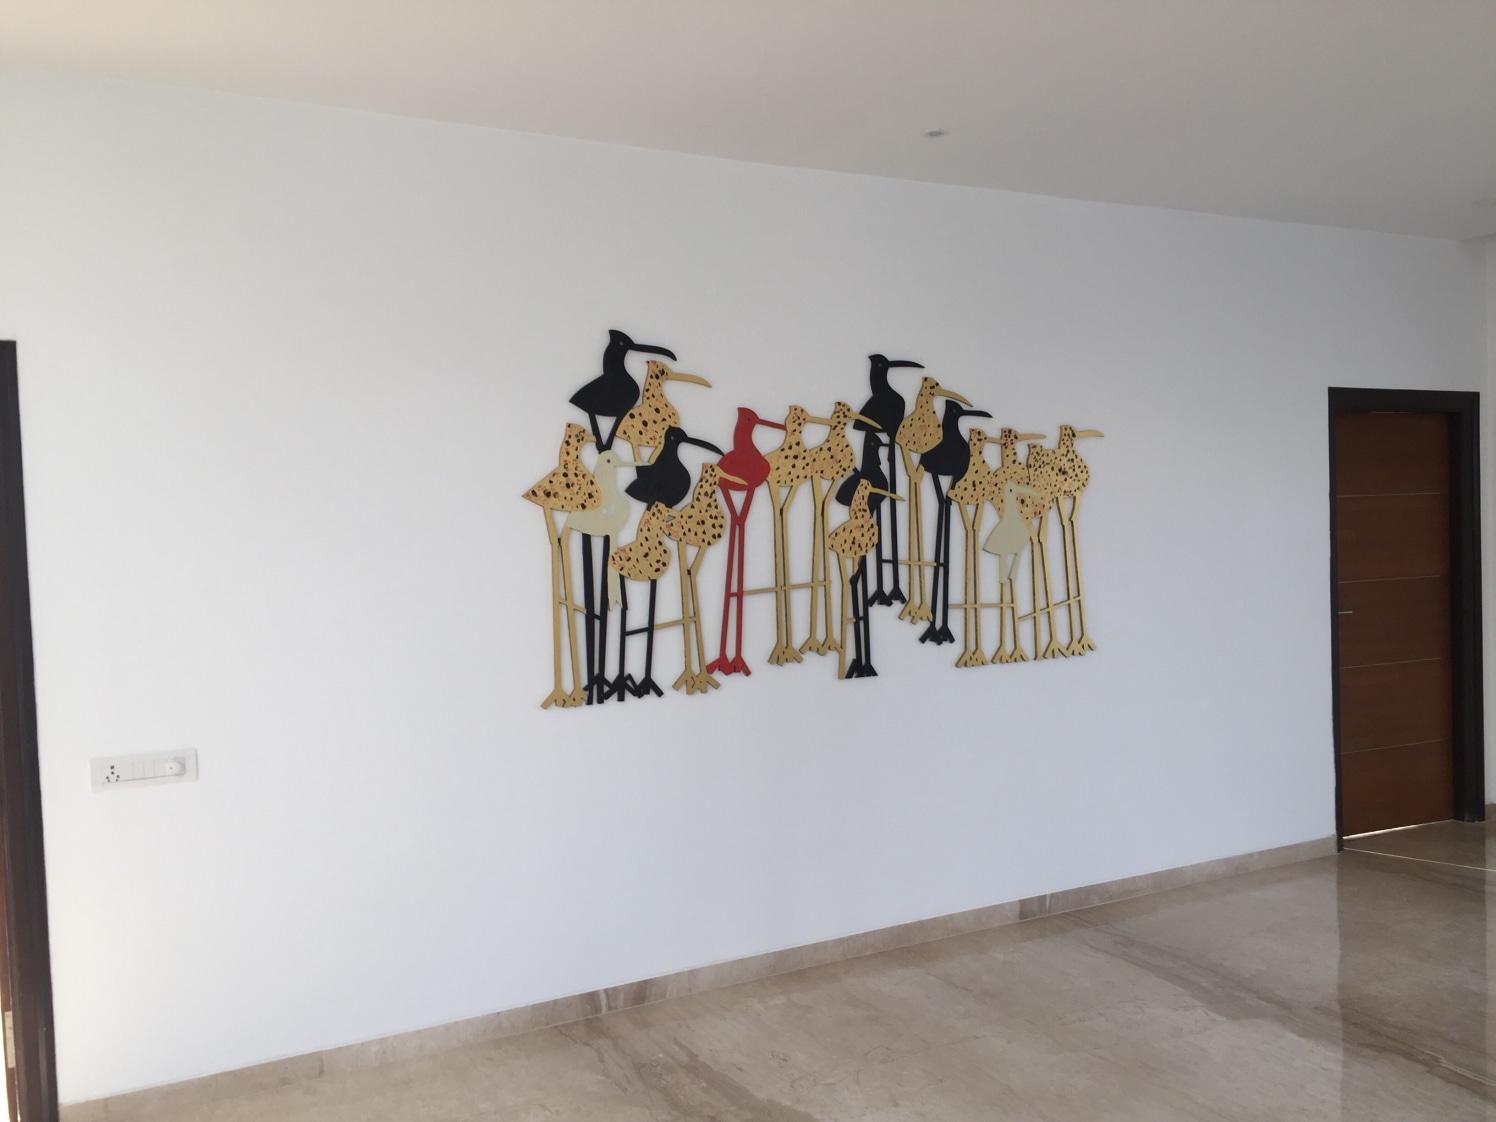 Whimsical Wall by Riyazandswamy